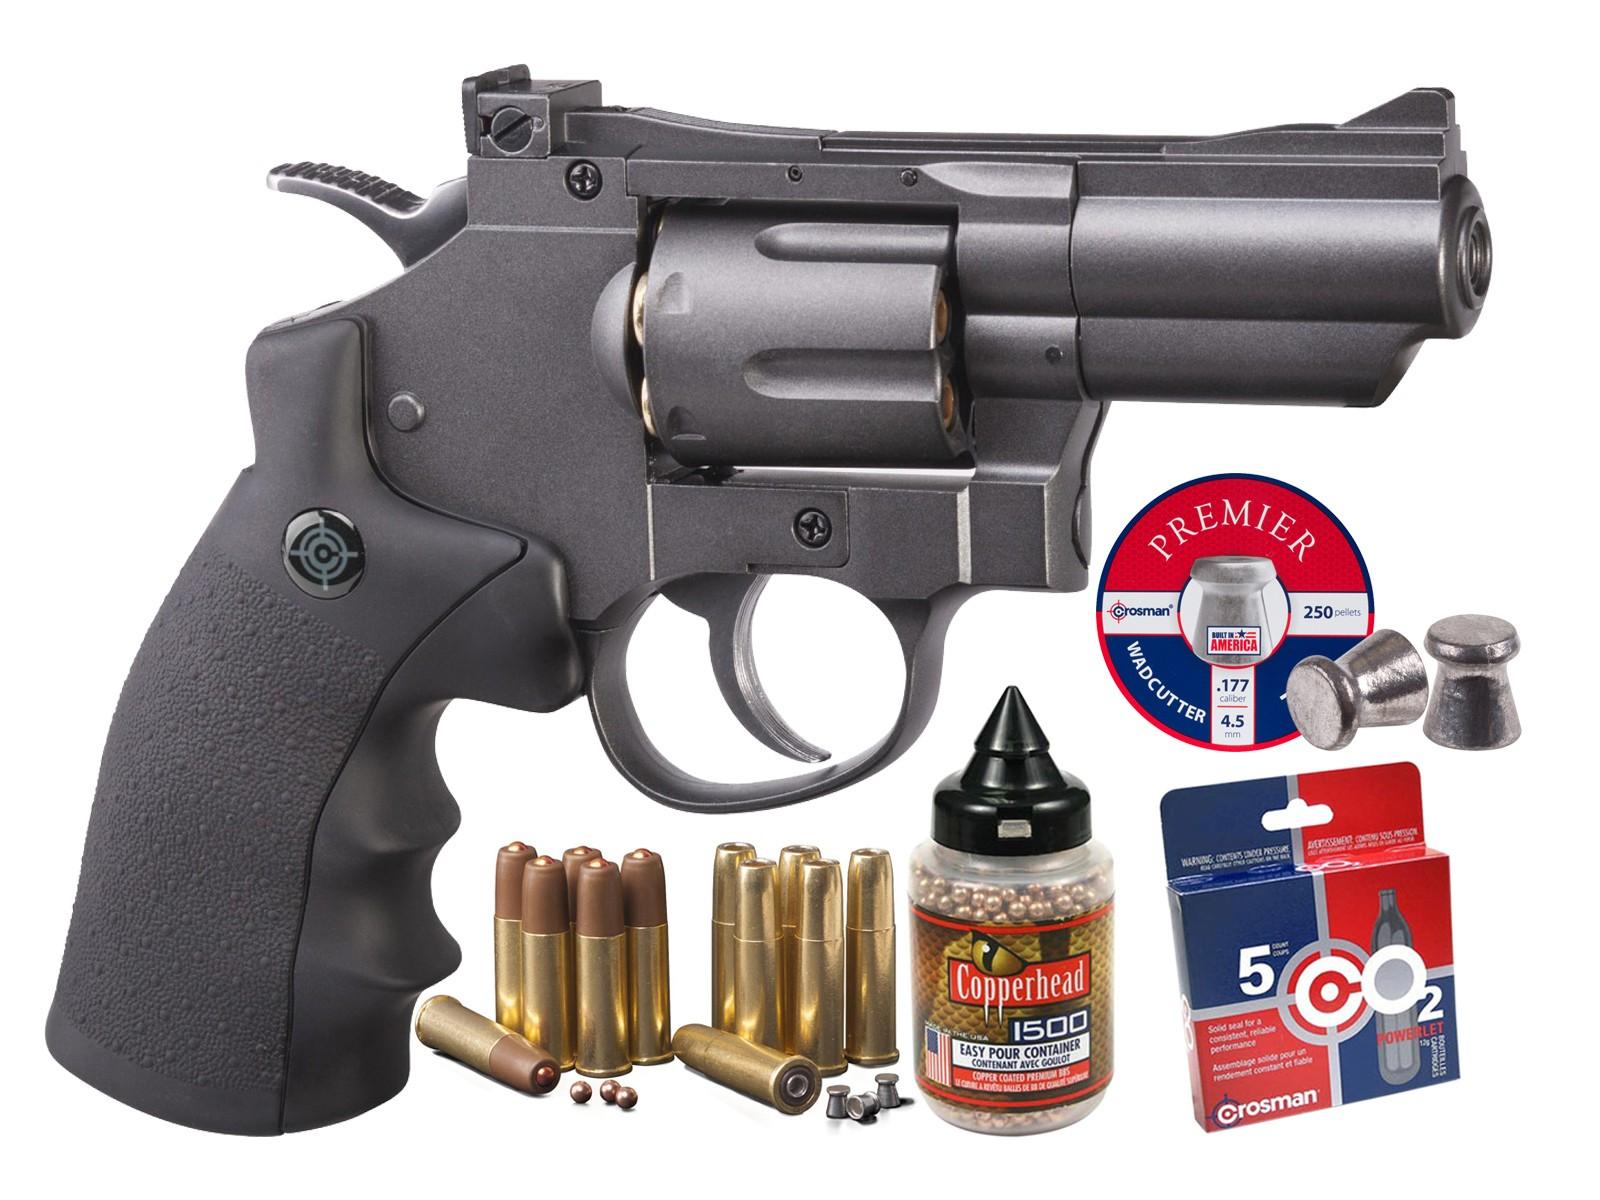 Crosman SNR357 CO2 Dual Ammo Full Metal Revolver Kit